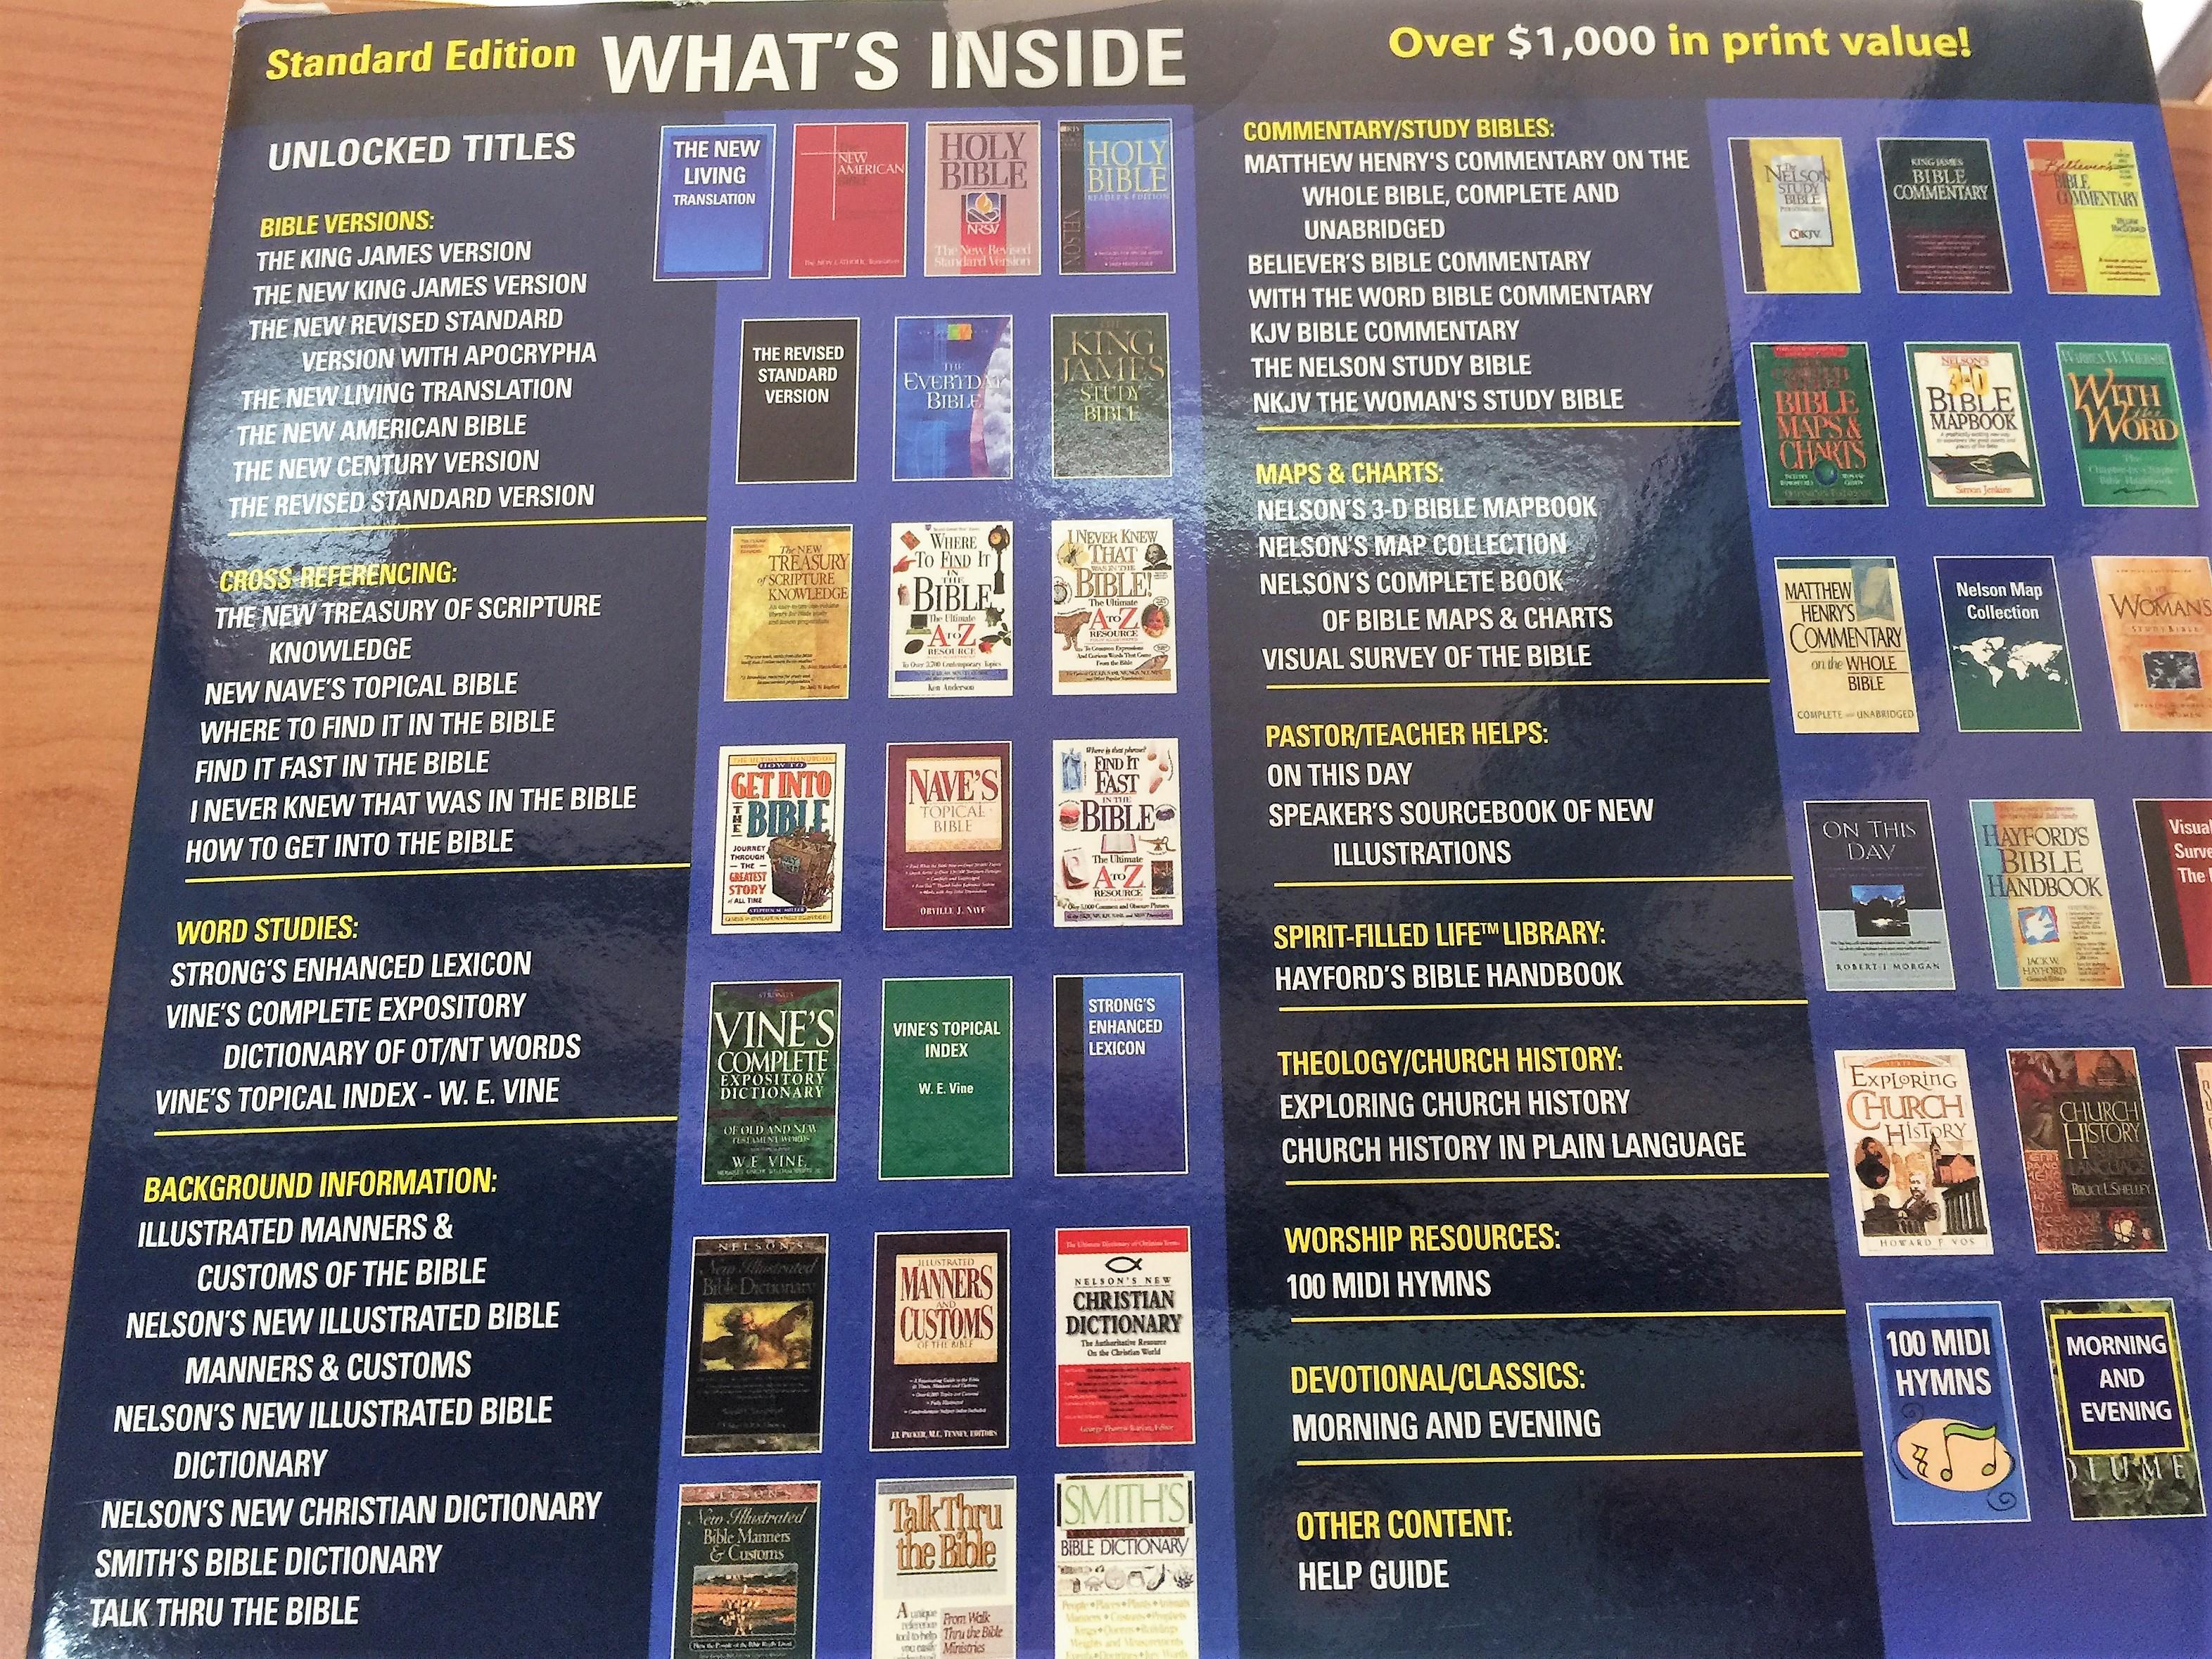 Nkjv Student Bible